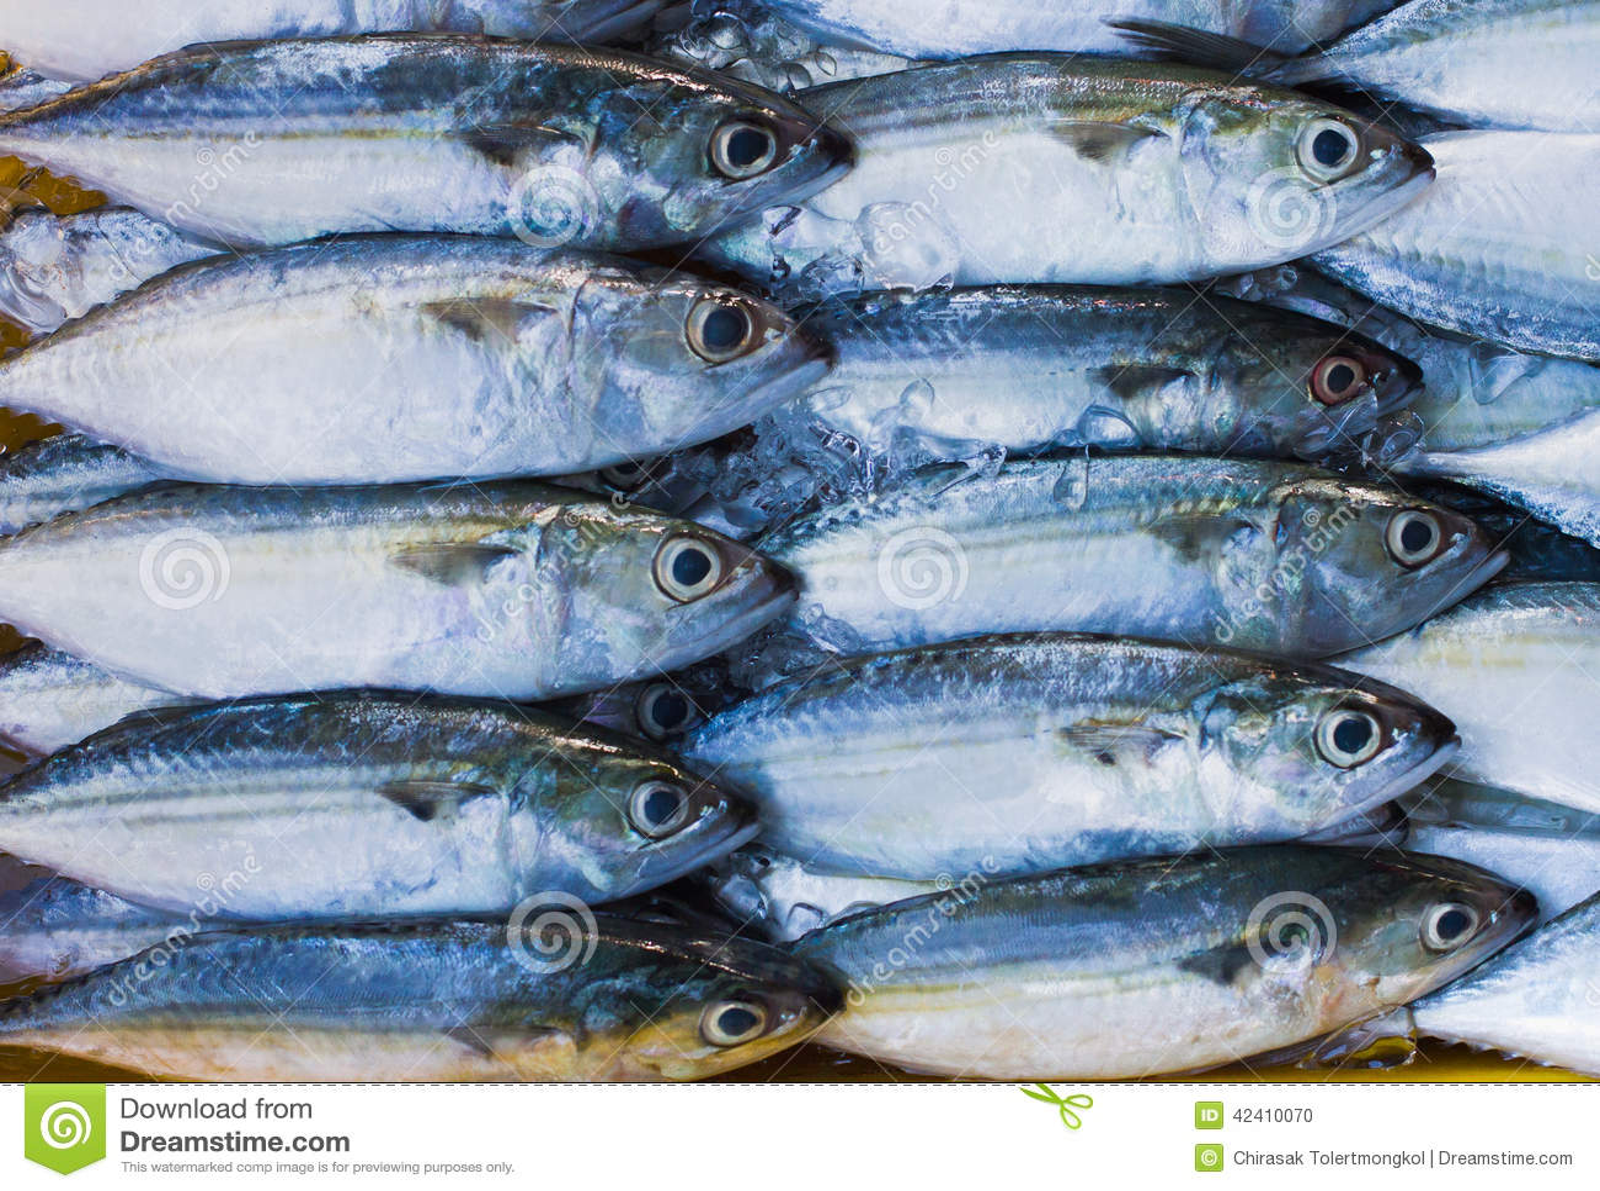 Frozen fish stock photo image 42410070 for Best frozen fish